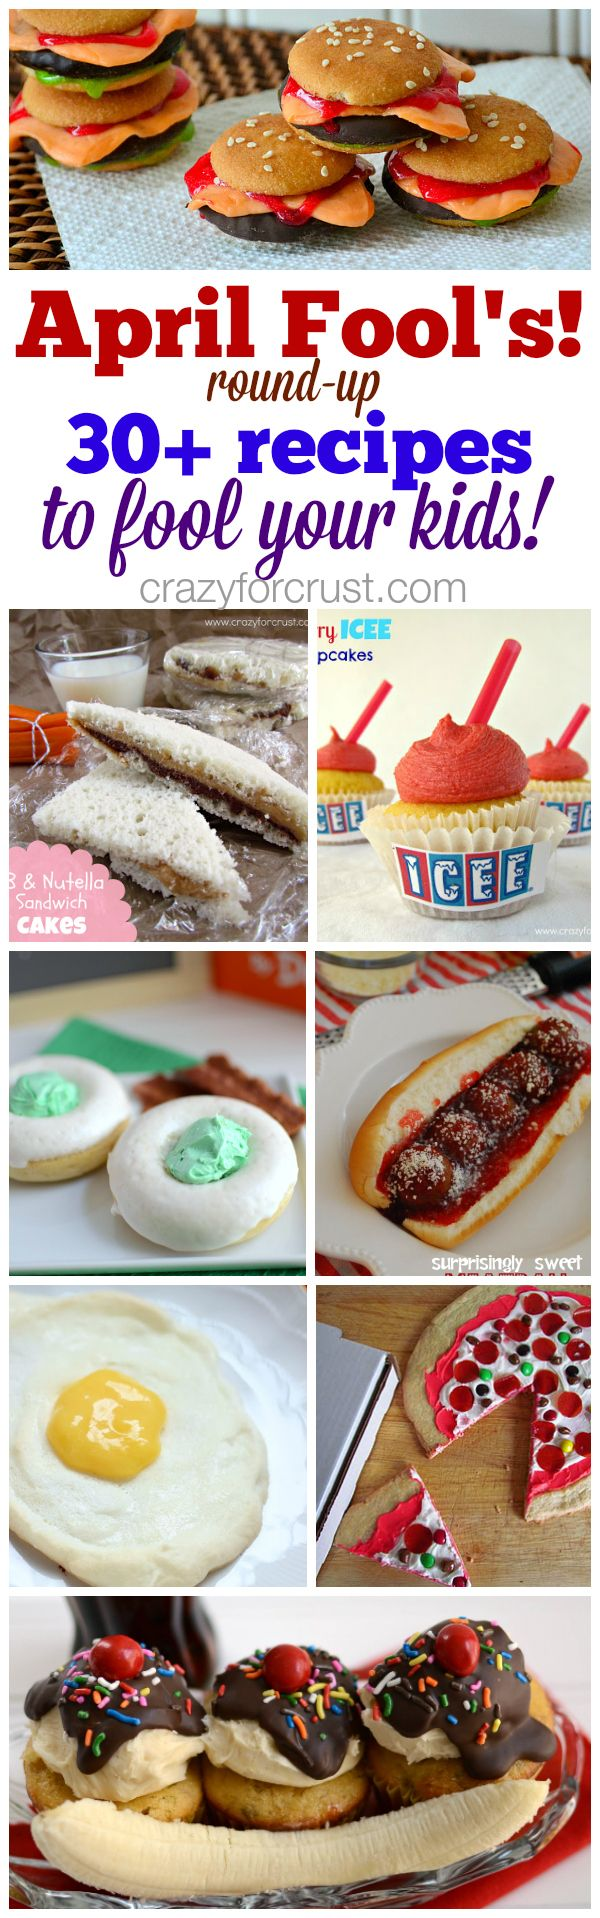 April Fool's Day recipes to fool your kids | crazyforcrust.com